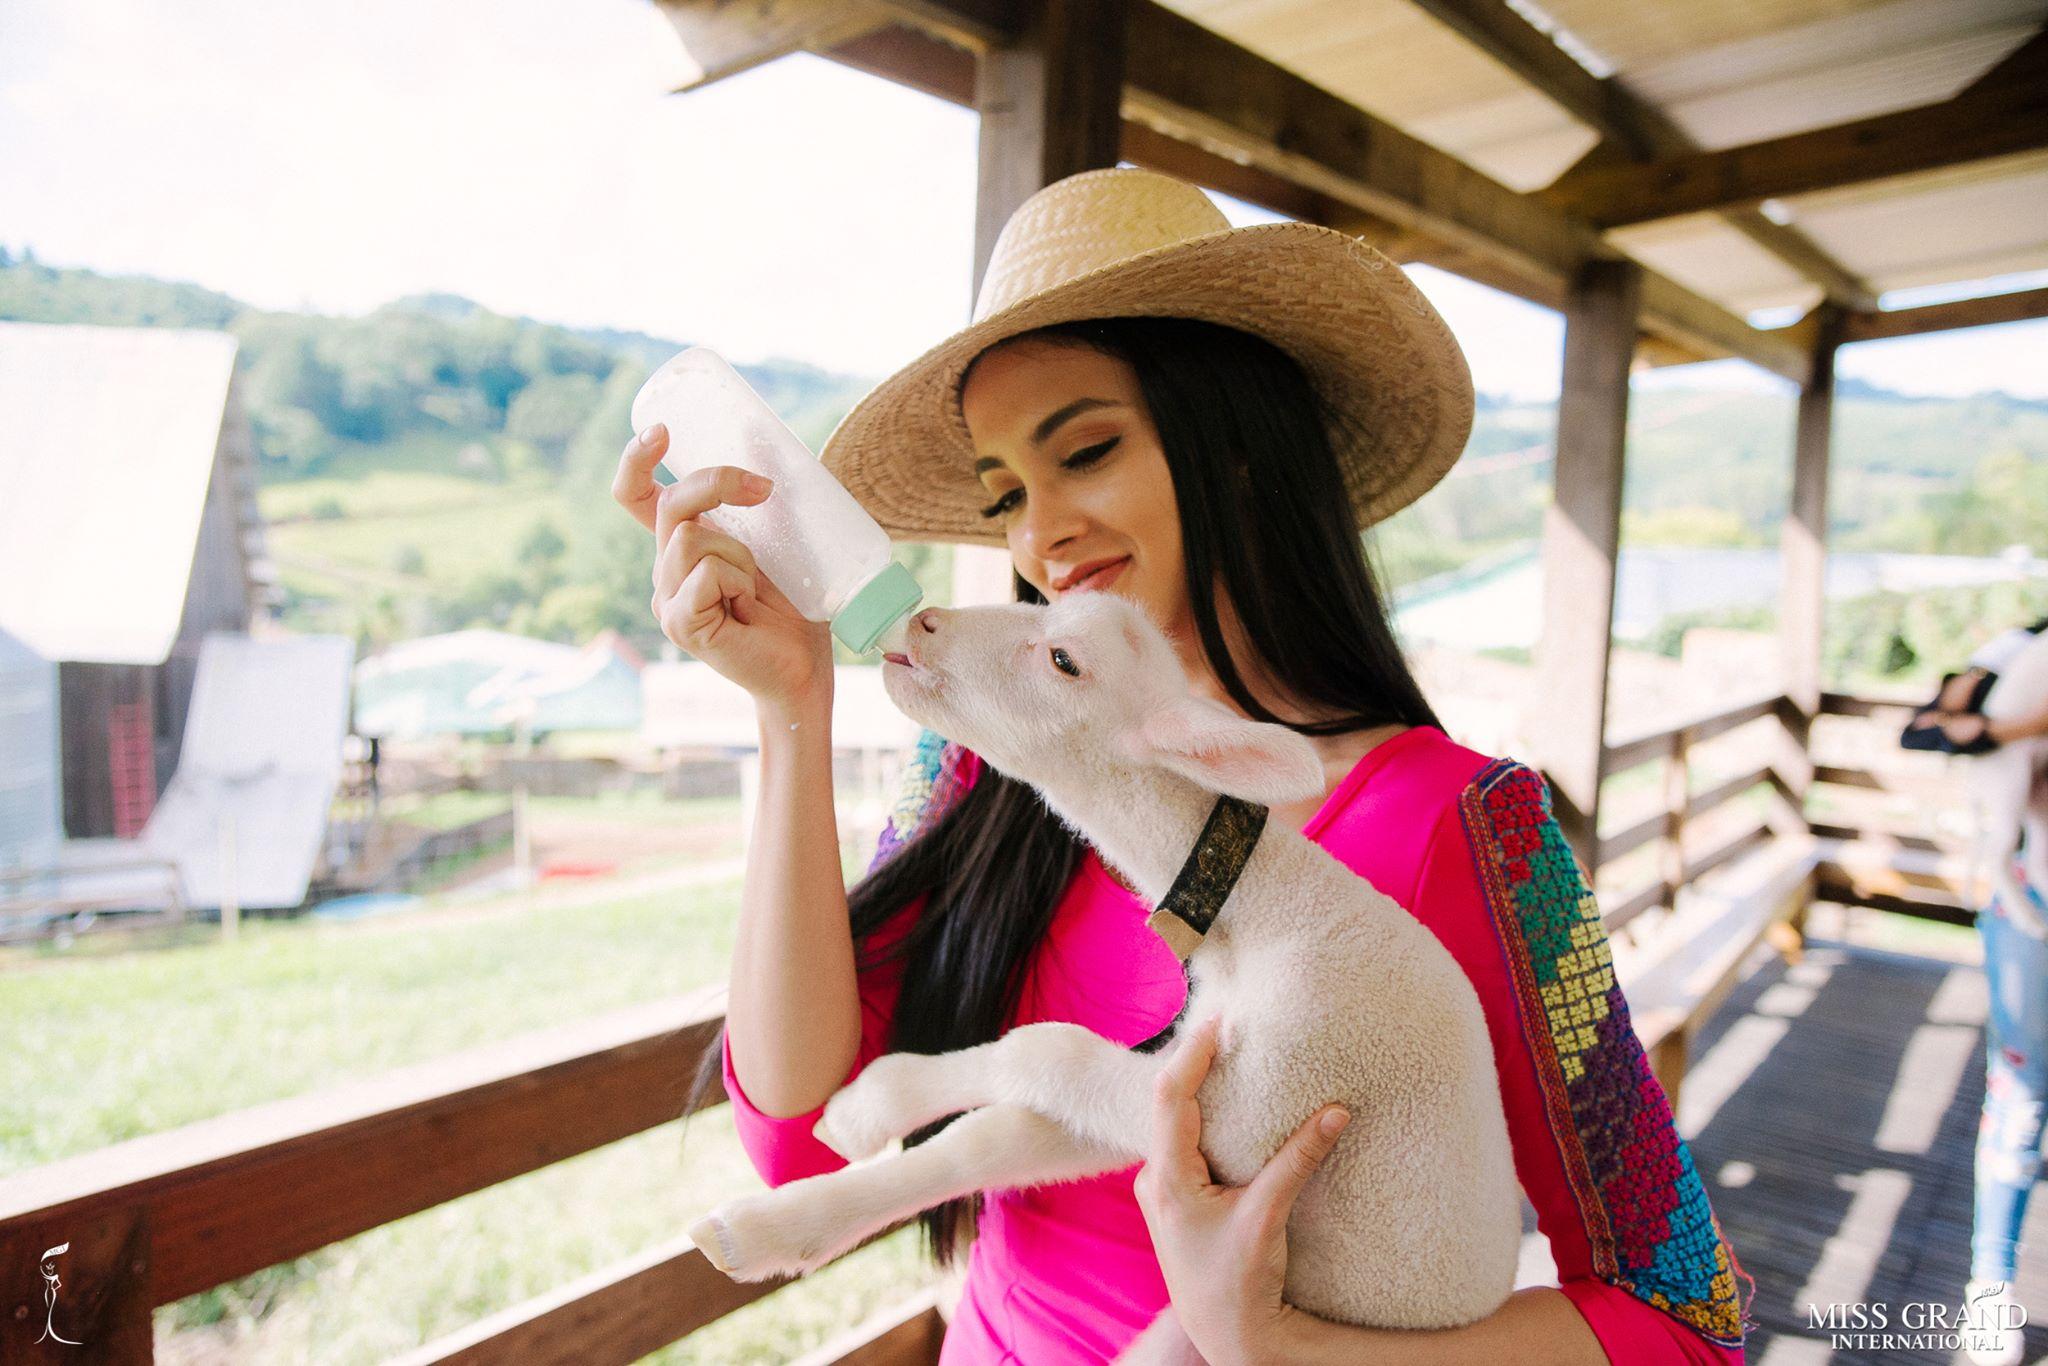 miss grand international 2018 visitando brasil para assistir a final de miss grand brasil 2019. - Página 3 5s89ynoo